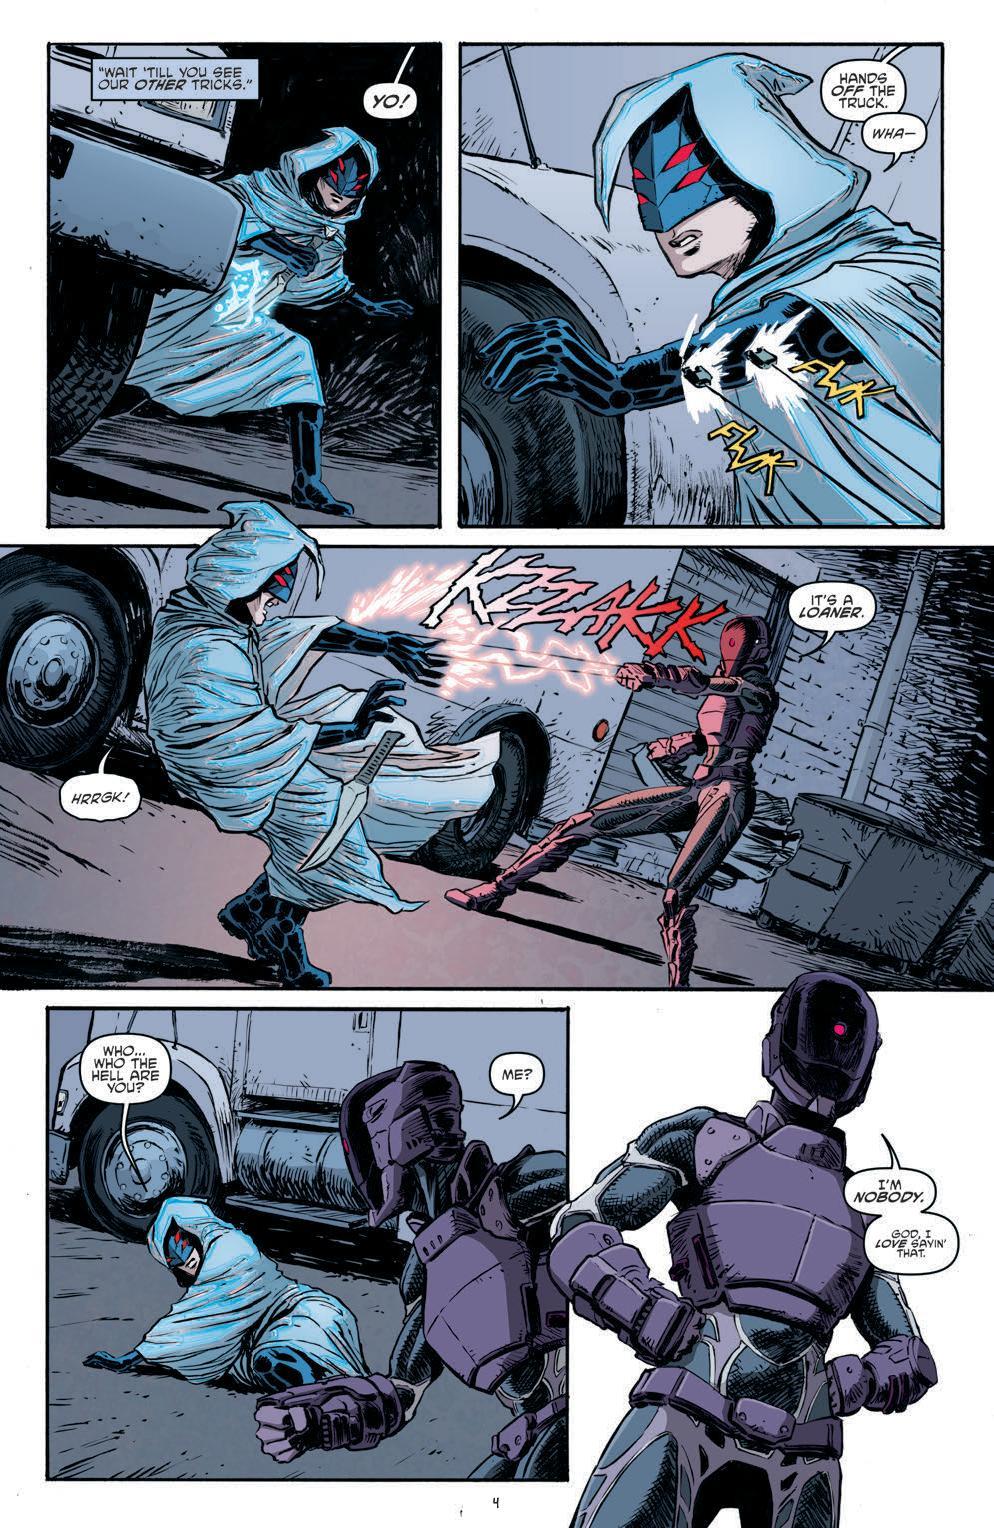 TMNT_61-pr-page-006